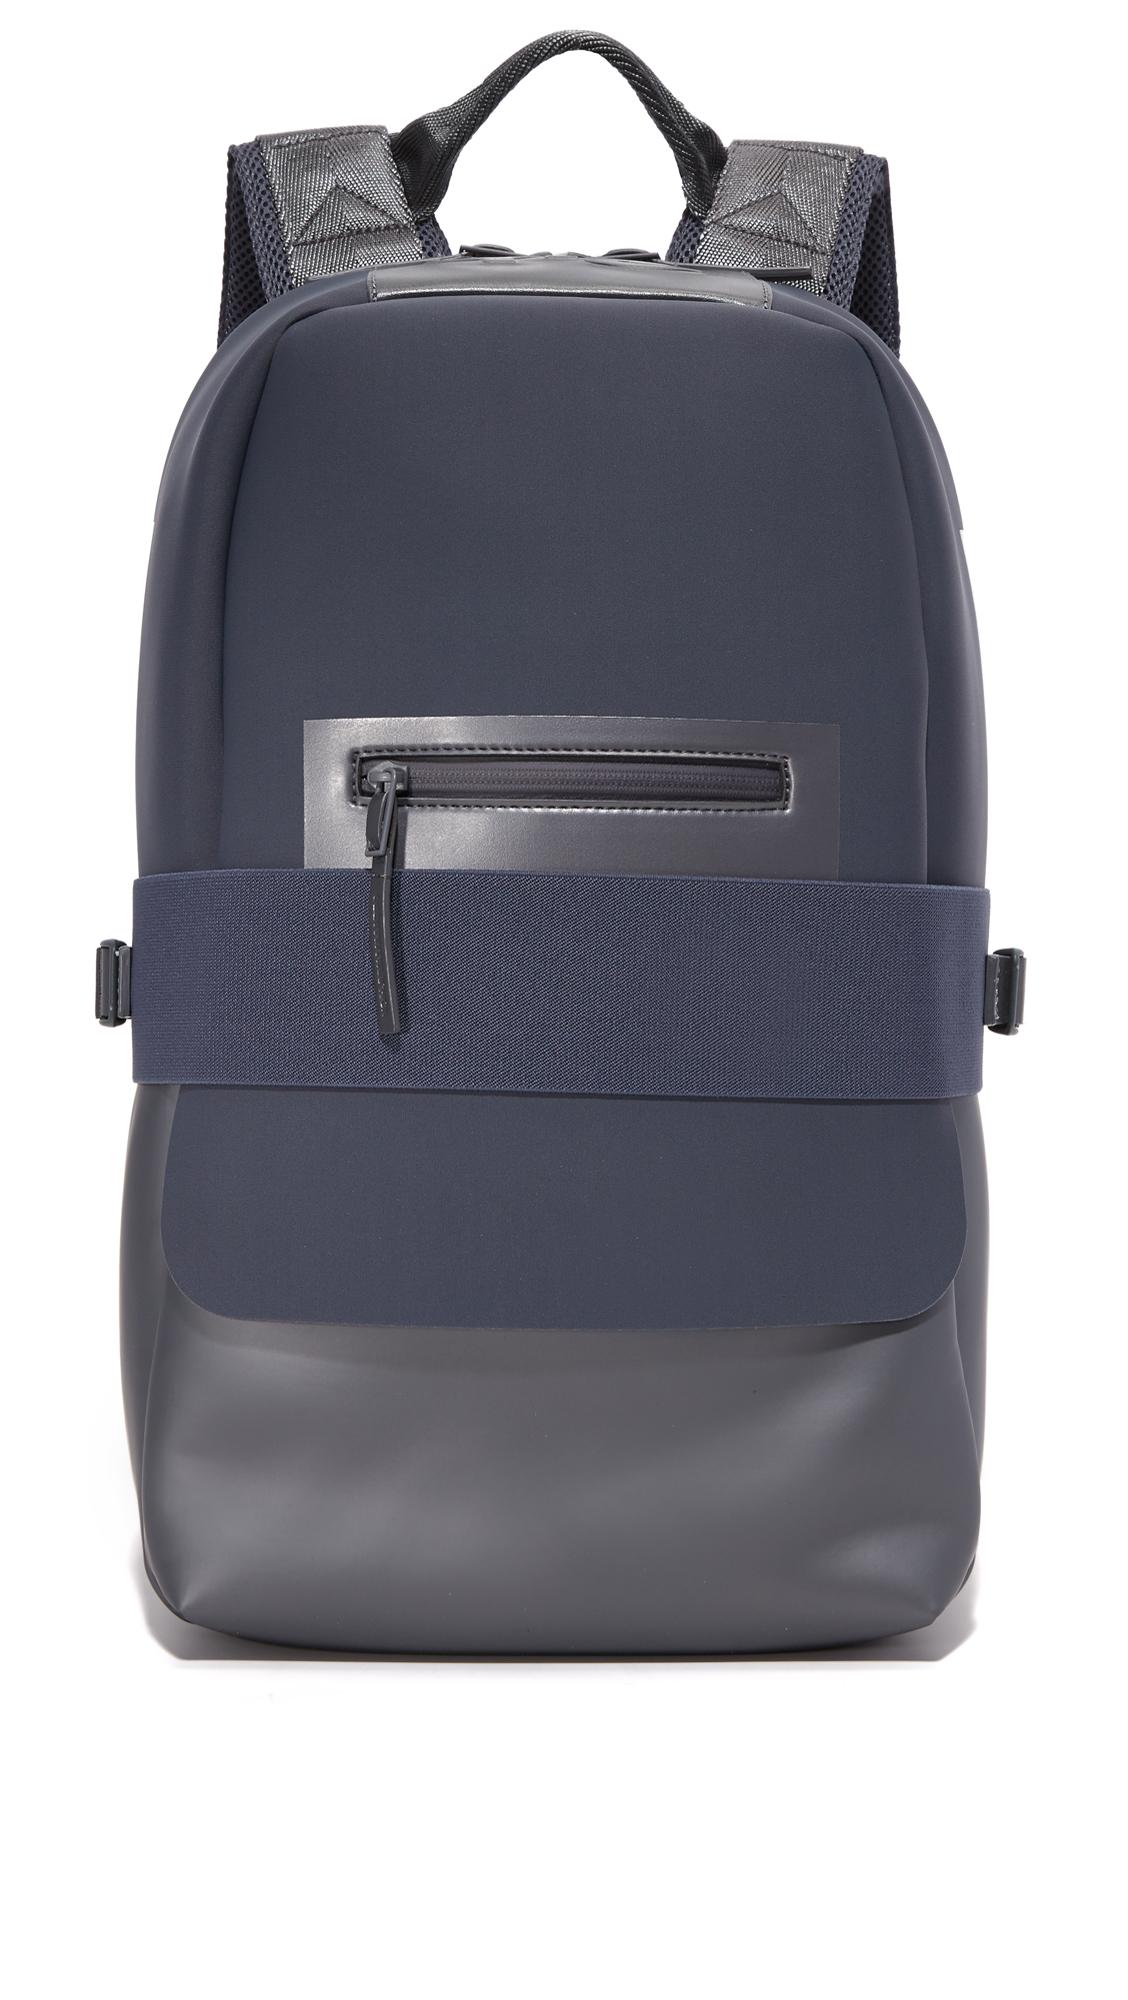 83fed44e226d Y-3 Blue   Grey Small Qasa Backpack In Night Metallic